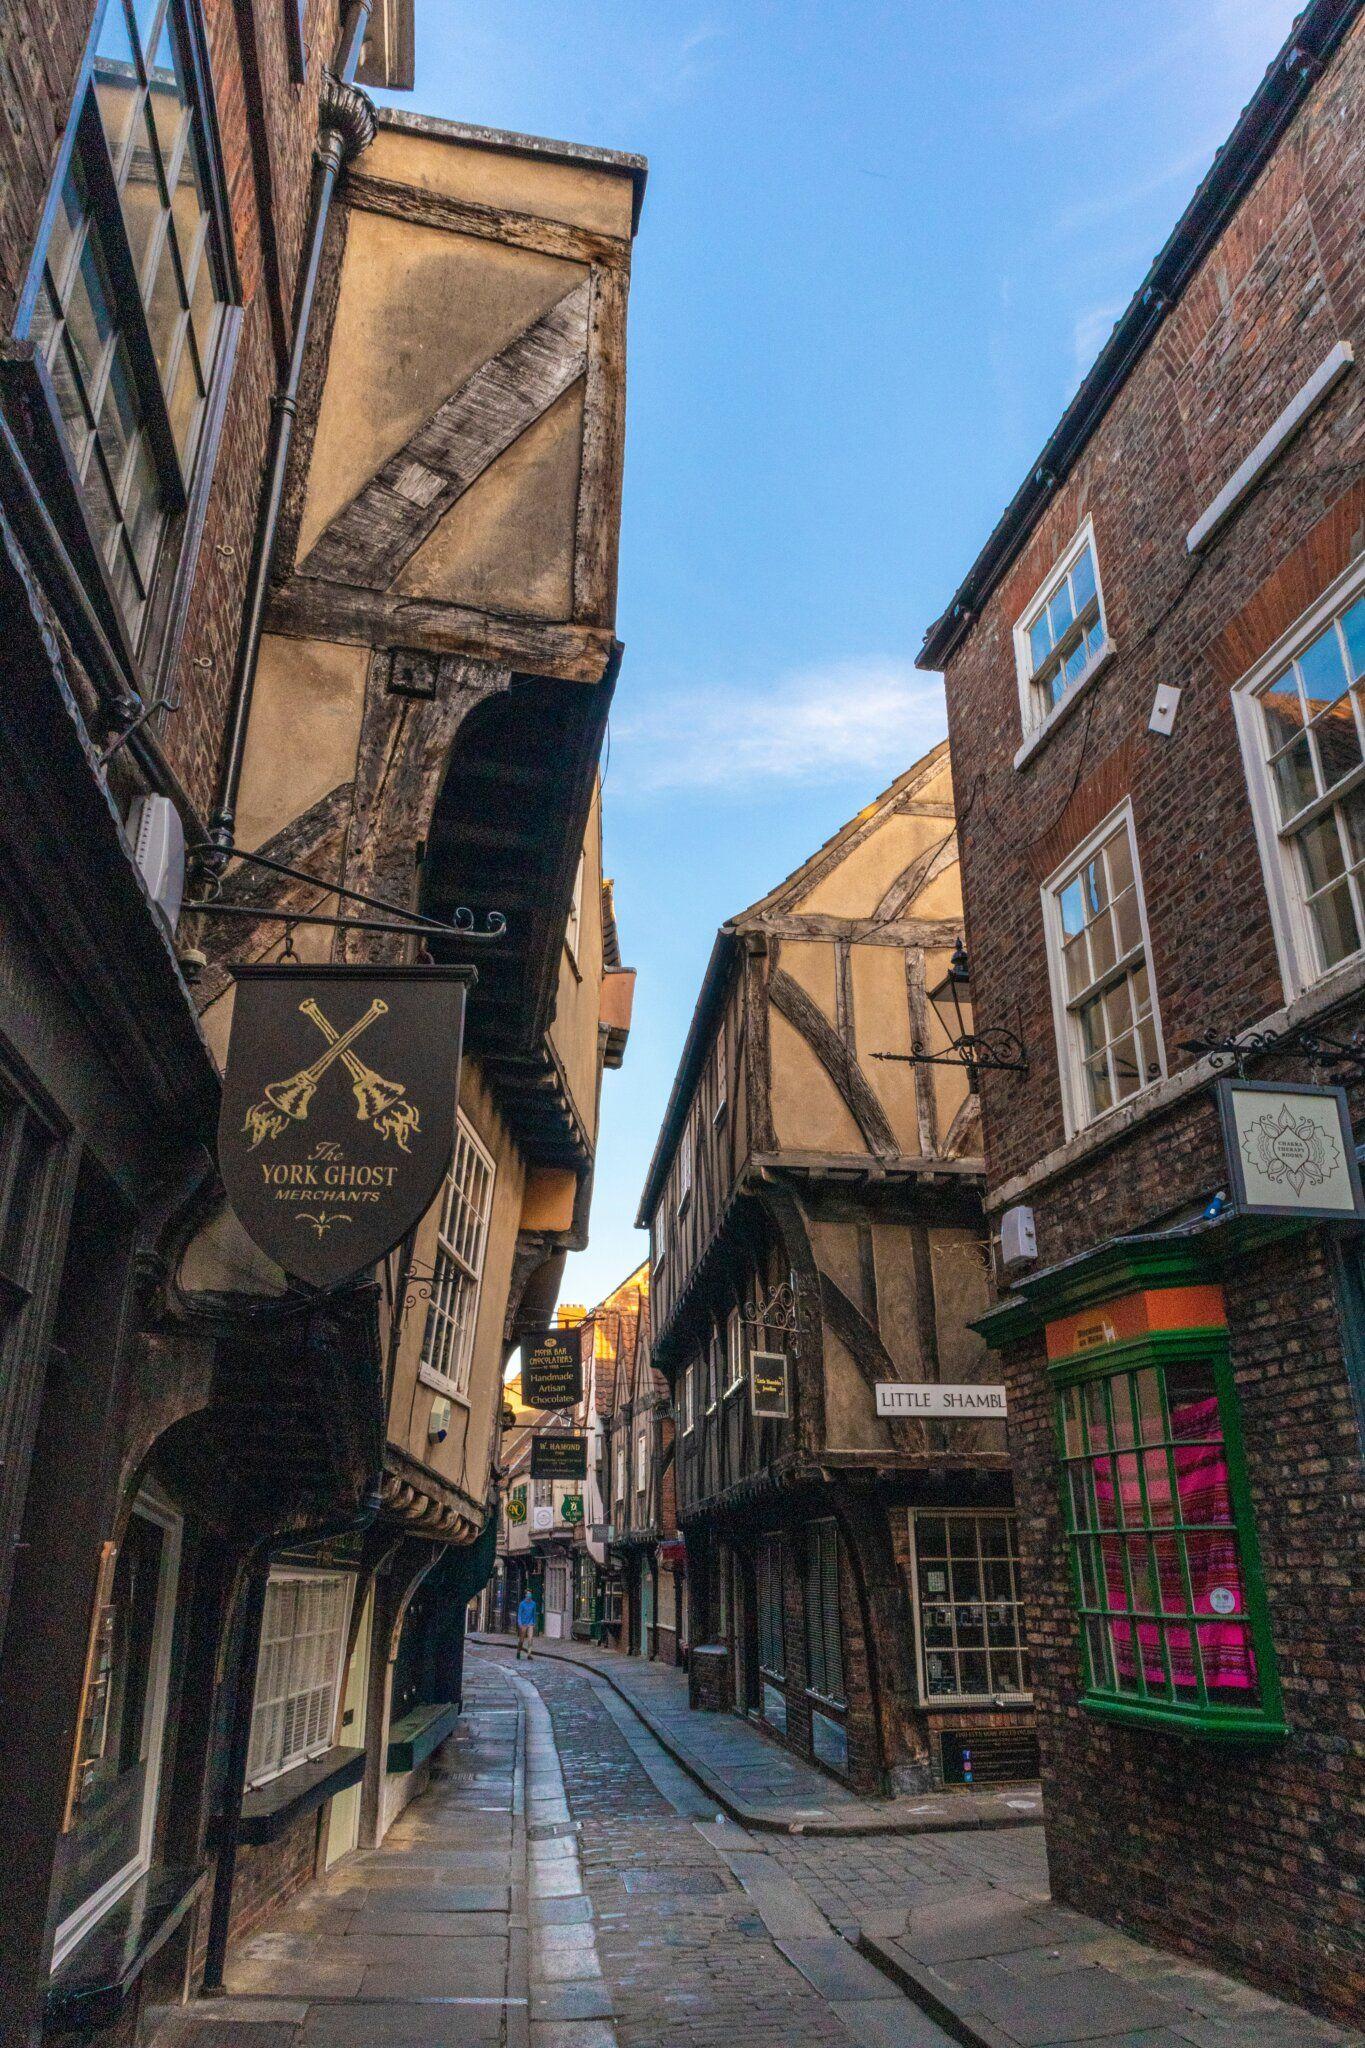 Reality Shifting to Hogwarts: Methods, Scripts & R